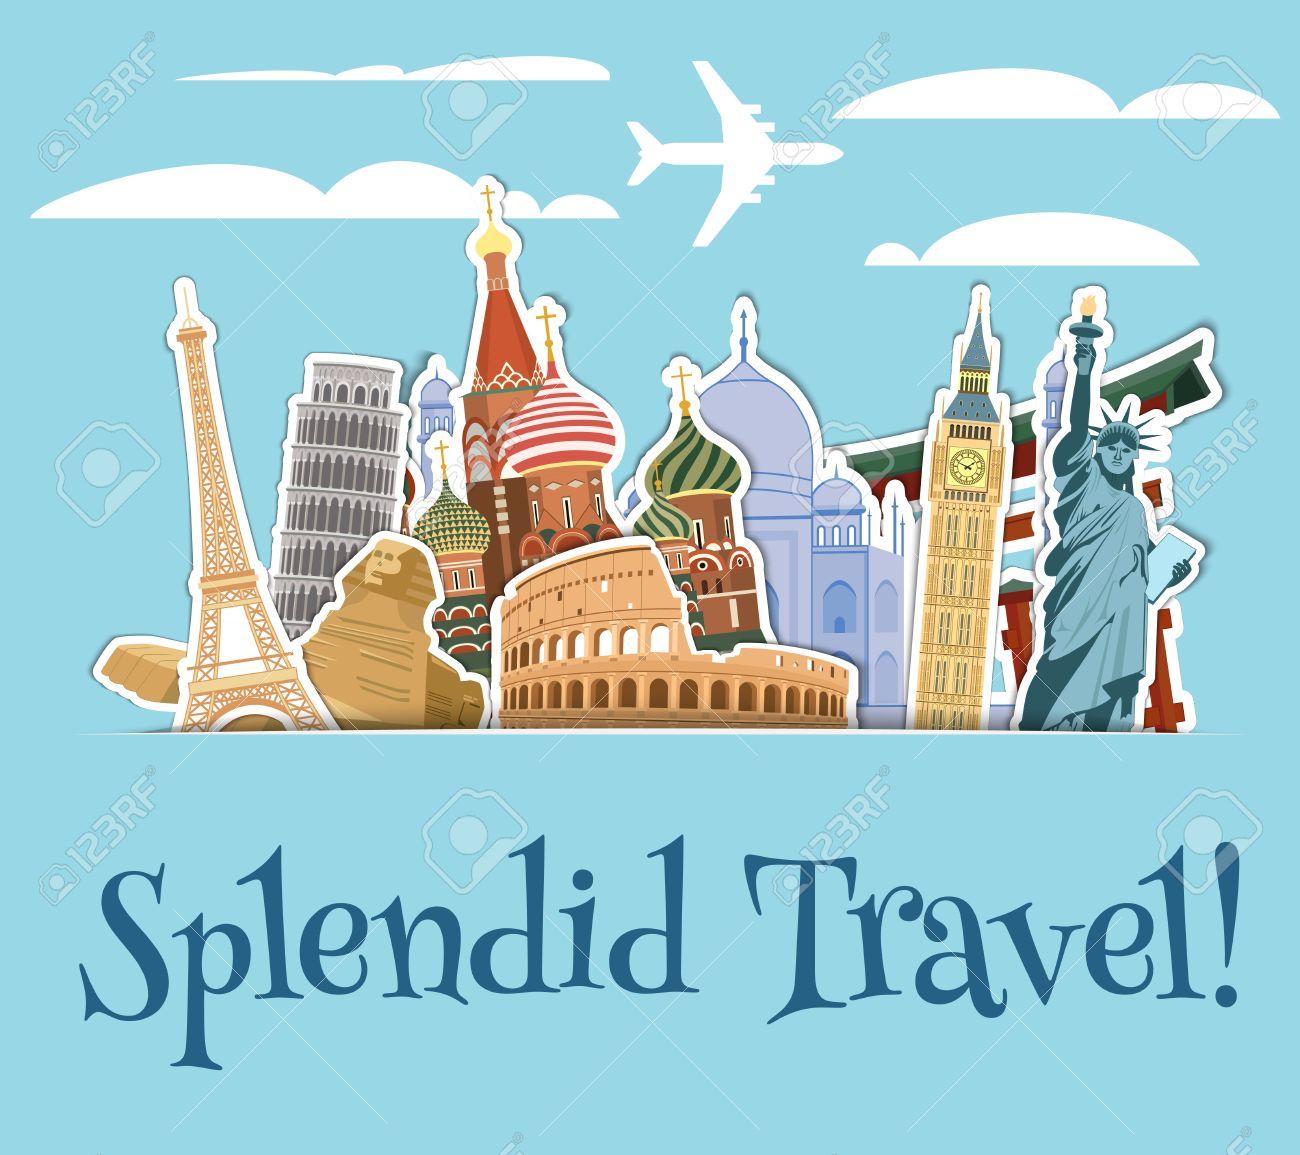 World landmarks sticker icons set with sky scrapbook background vector illustration - 32133388